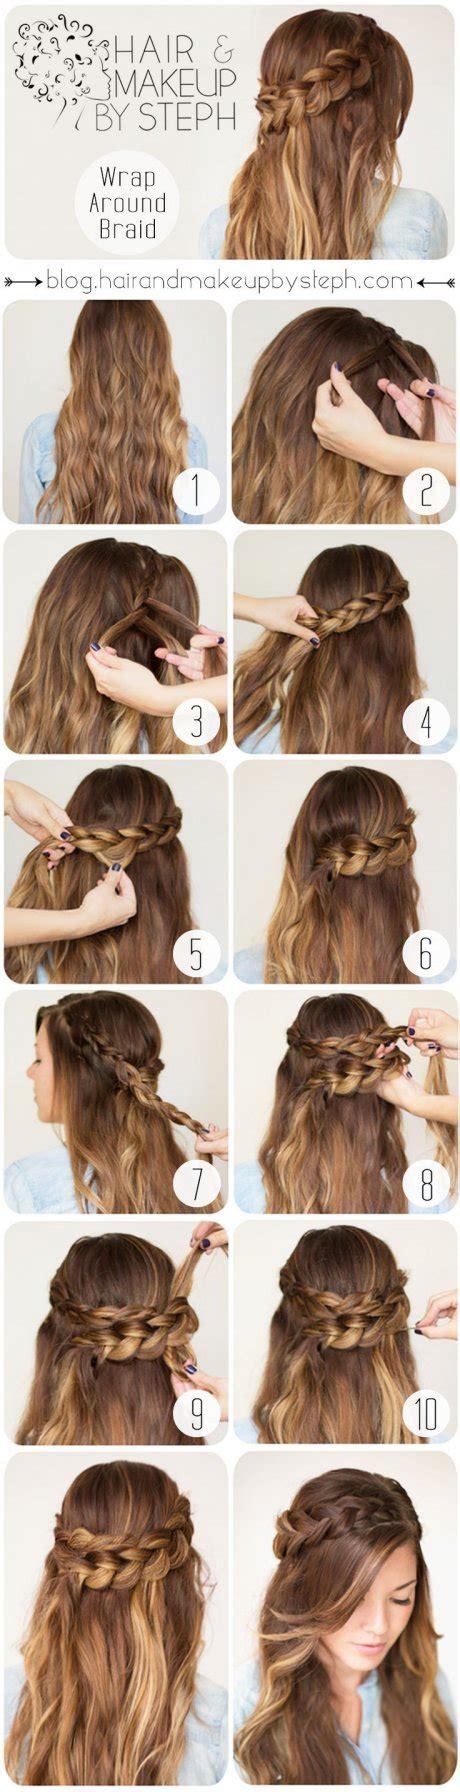 very easy and beautiful hairstyles tutoriales de trenzas actitudfem